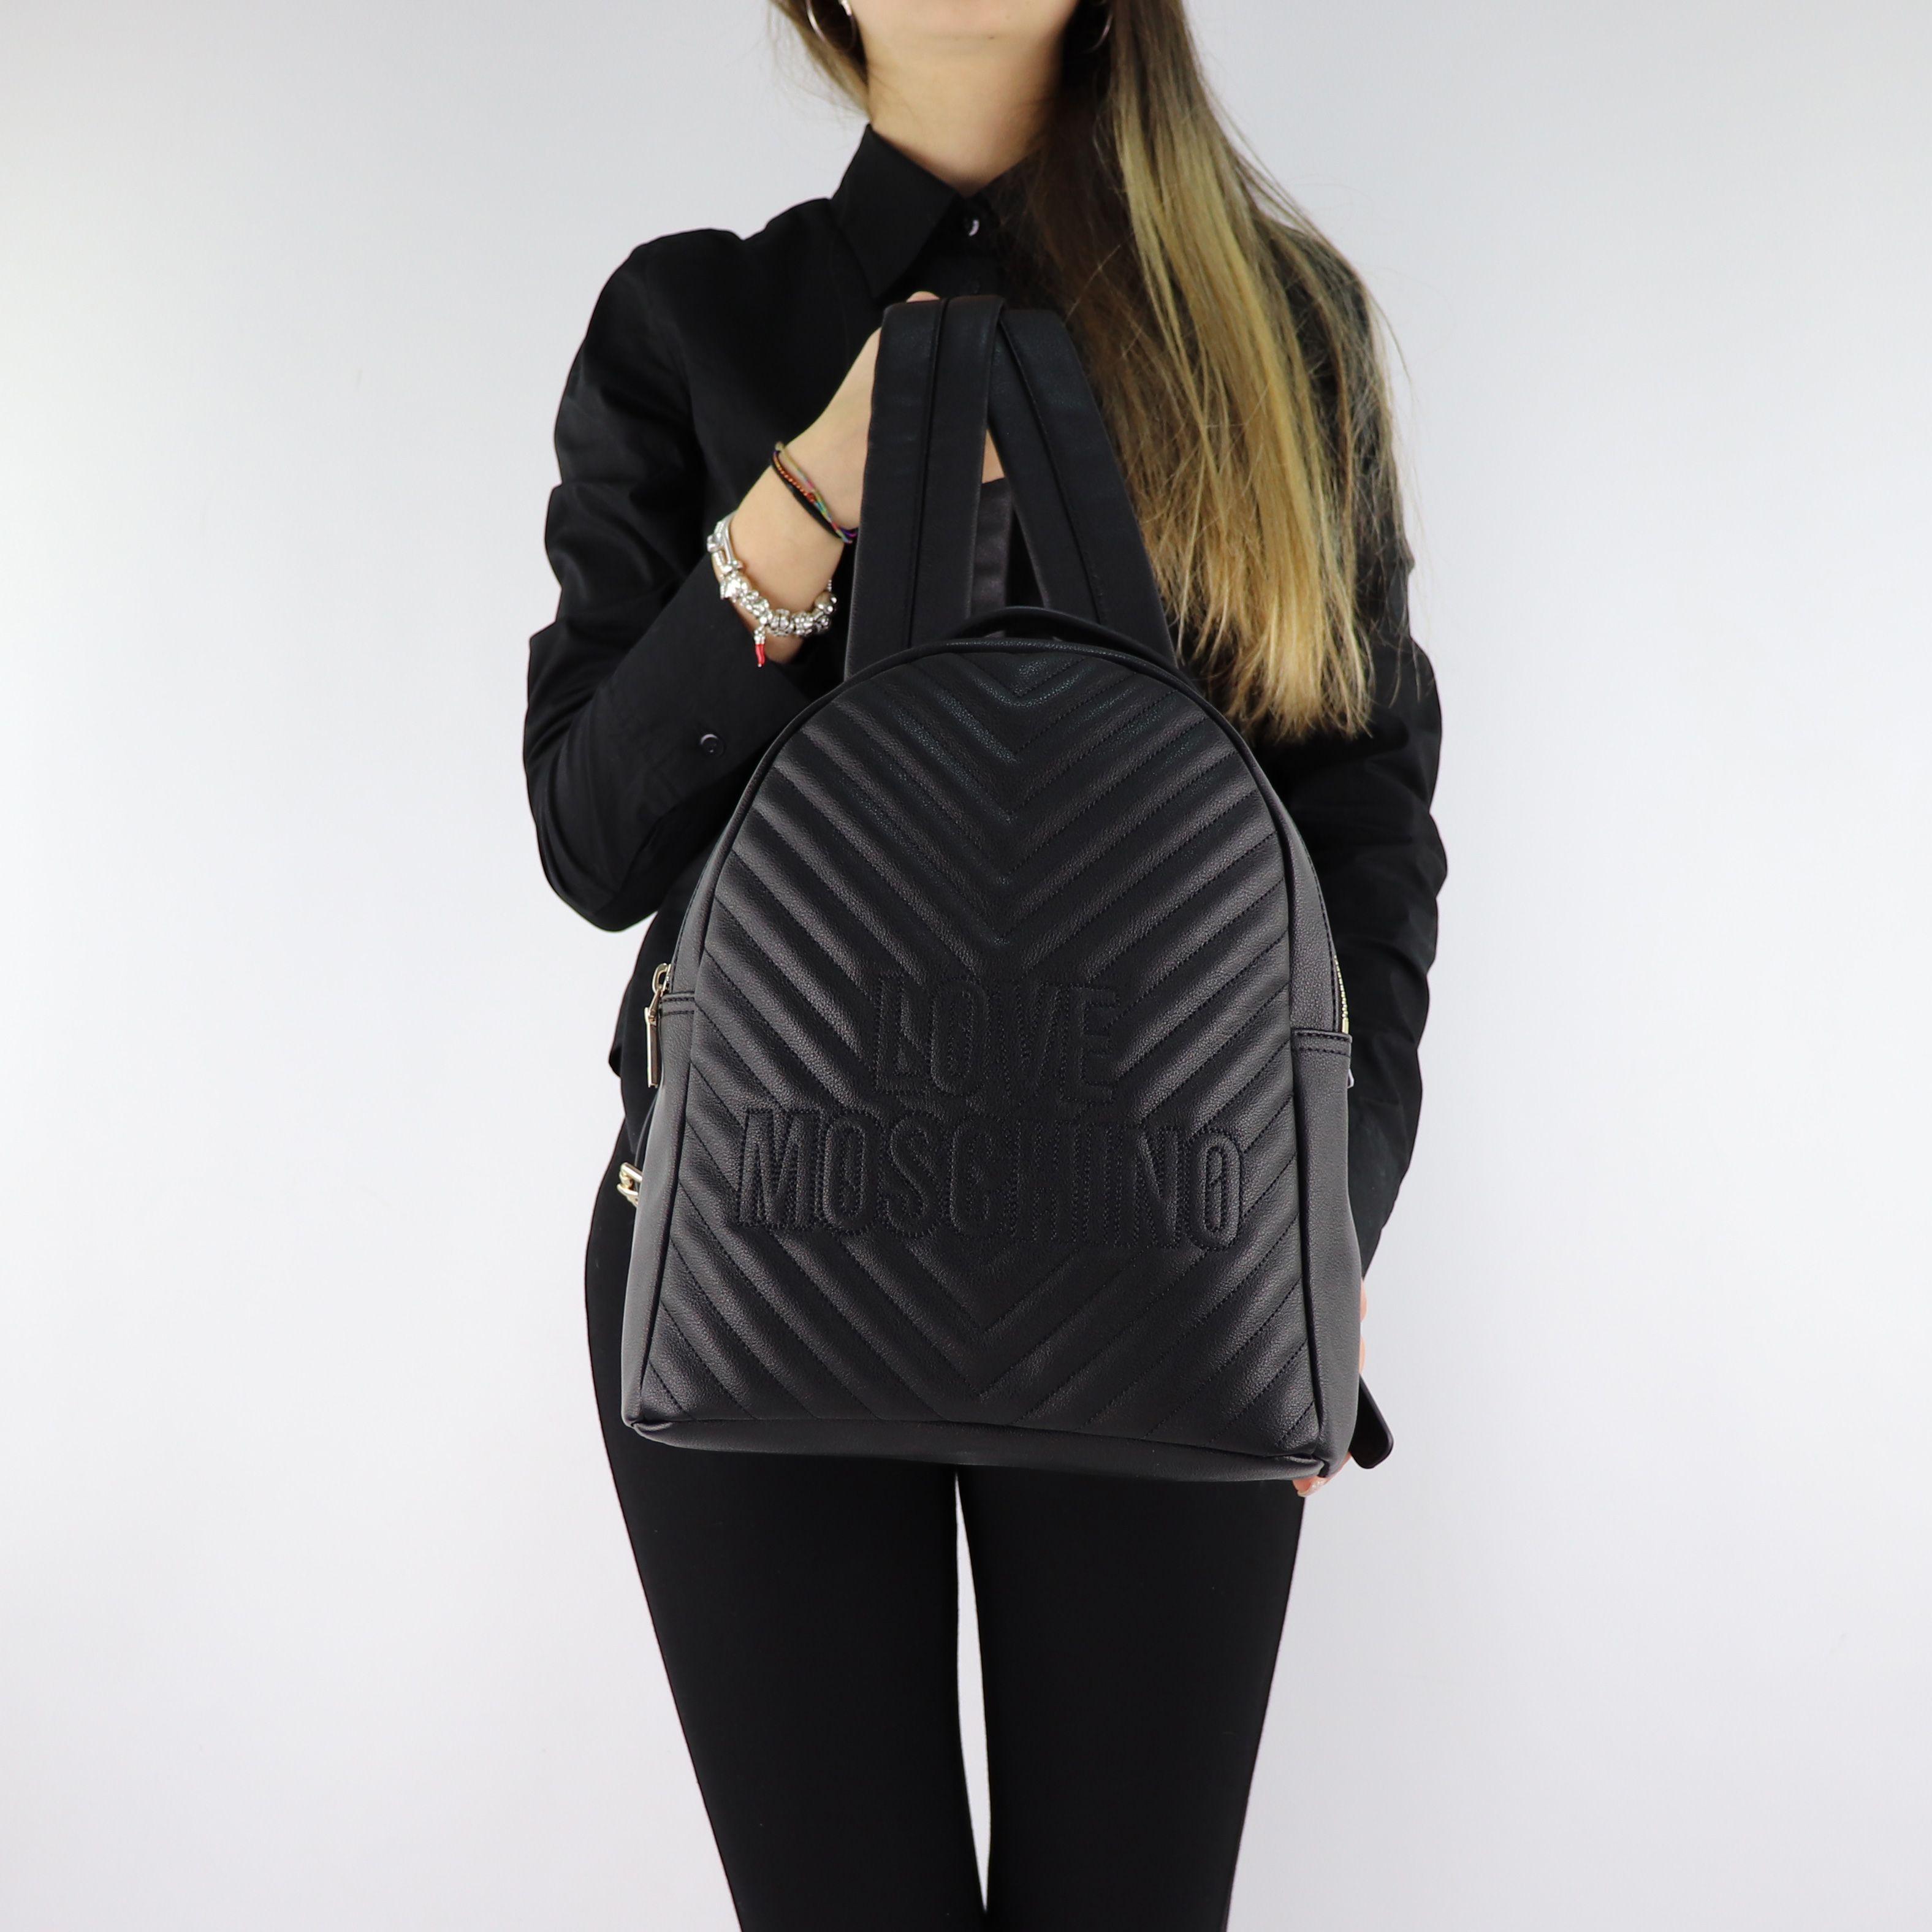 sac dos de la marque love moschino noir matelass avec. Black Bedroom Furniture Sets. Home Design Ideas